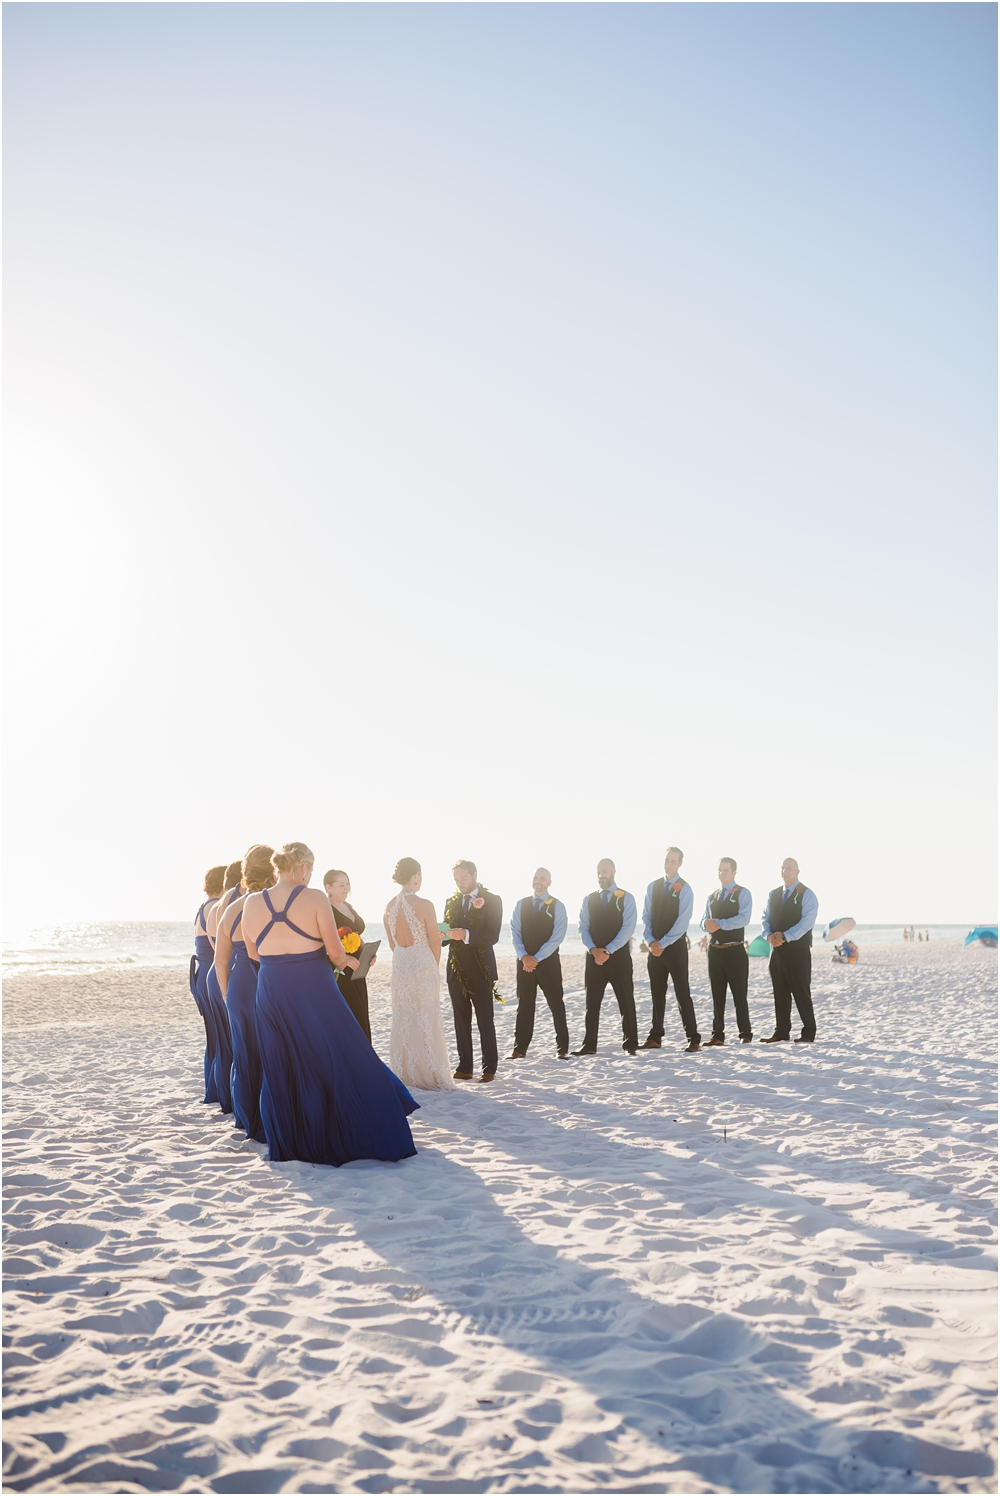 ledman-wedding-kiersten-stevenson-photography-30a-panama-city-beach-dothan-tallahassee-(216-of-763).JPG